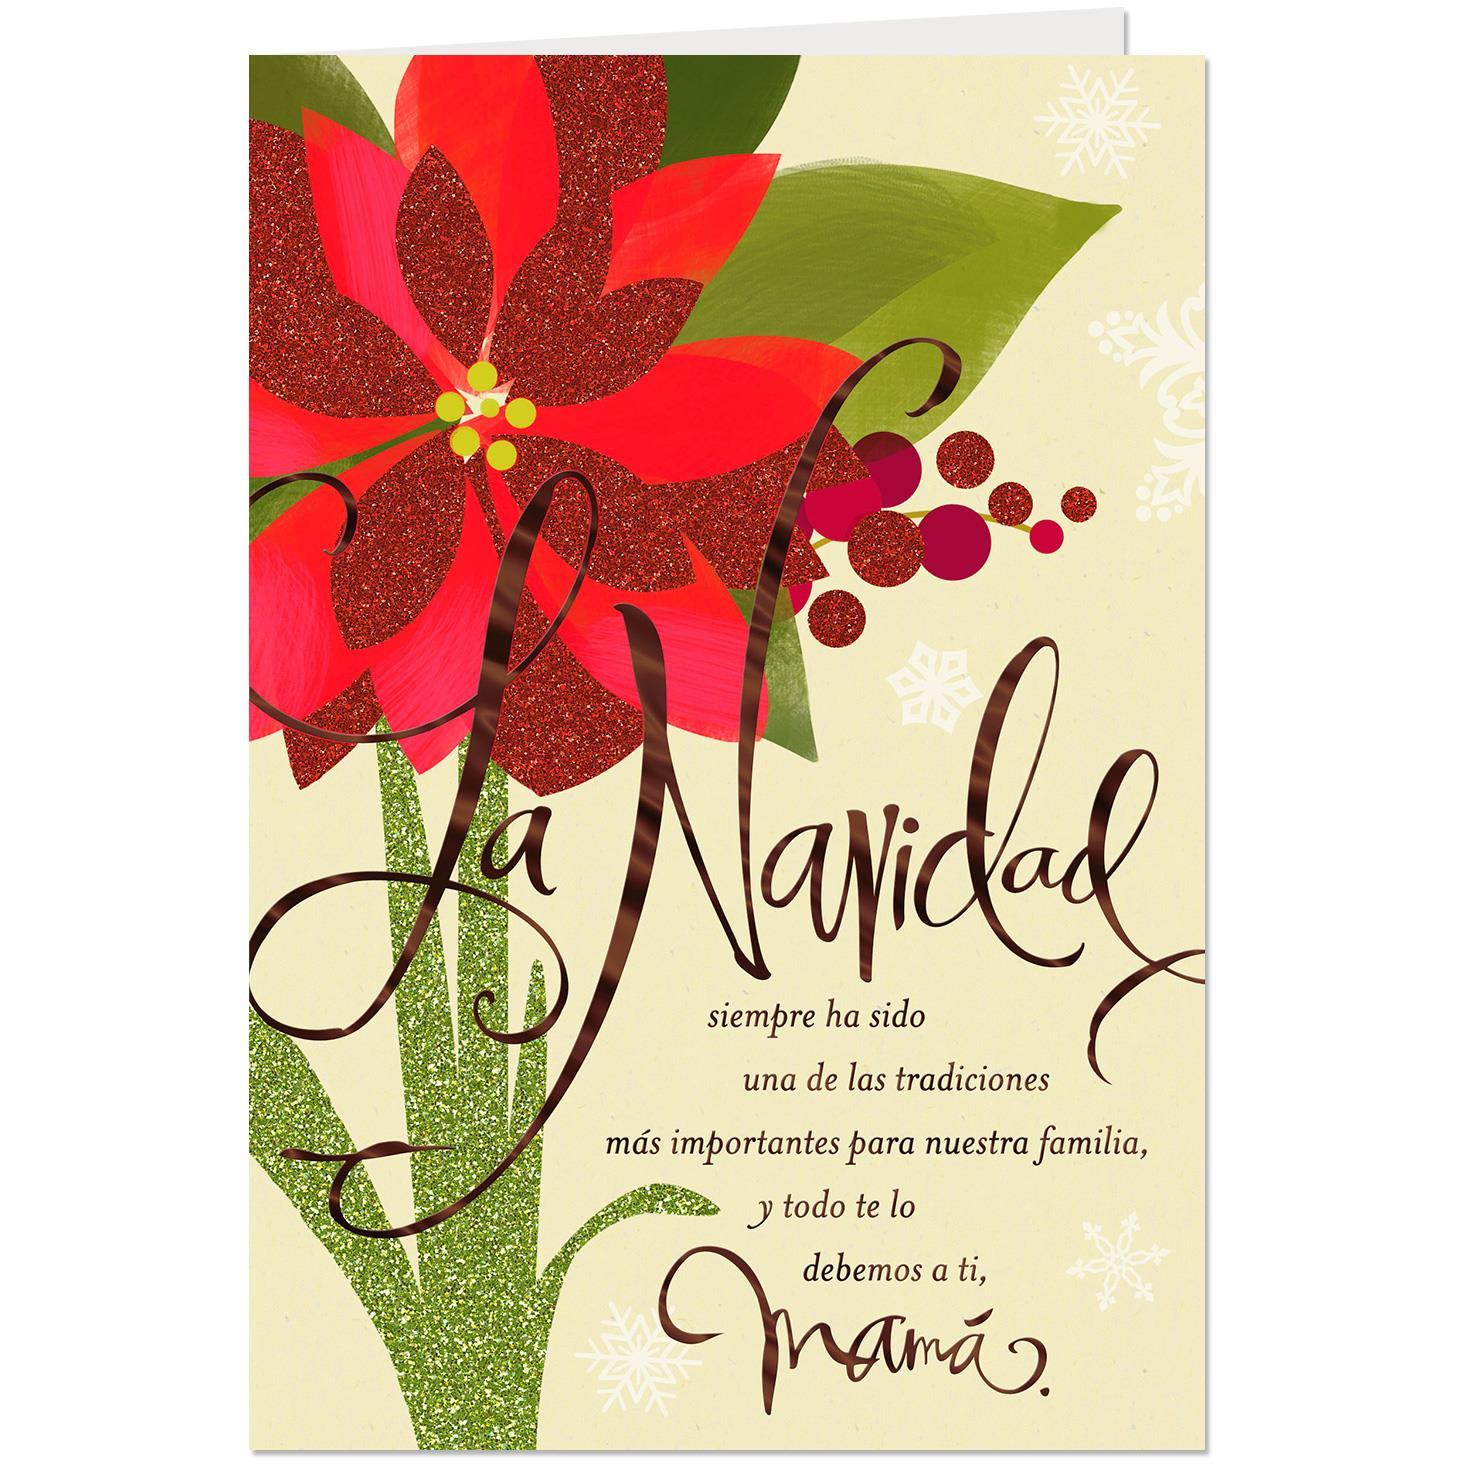 Glittery Poinsettia Spanish Language Christmas Card For Mom